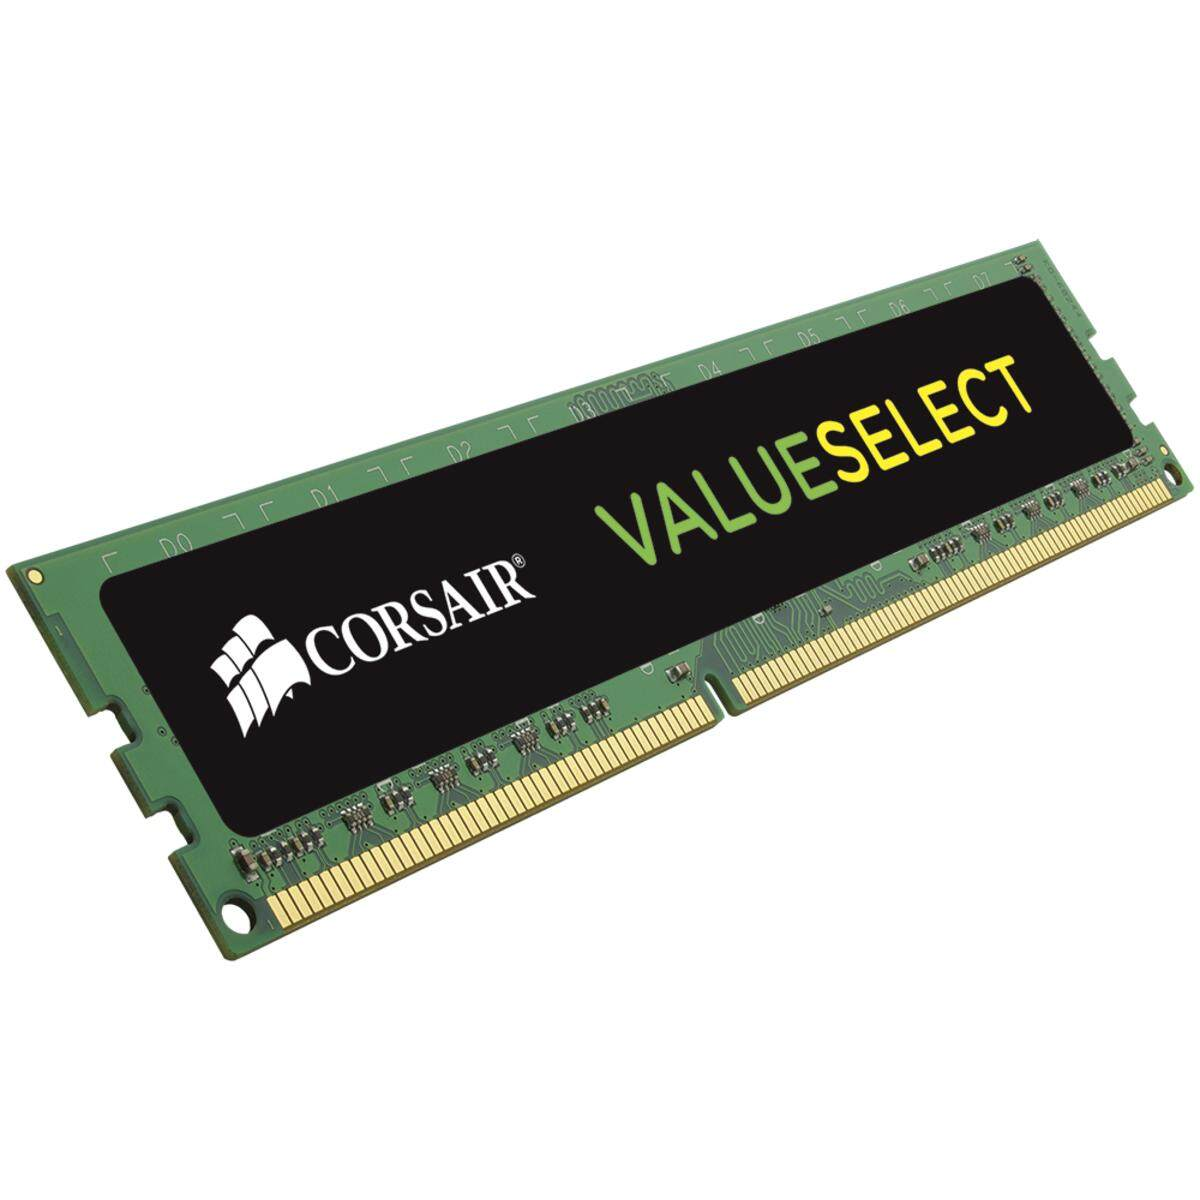 Corsair Value Select 4GB Desktop Memory RAM DDR3 DDR3L 1600MHz CL11 LODIMM